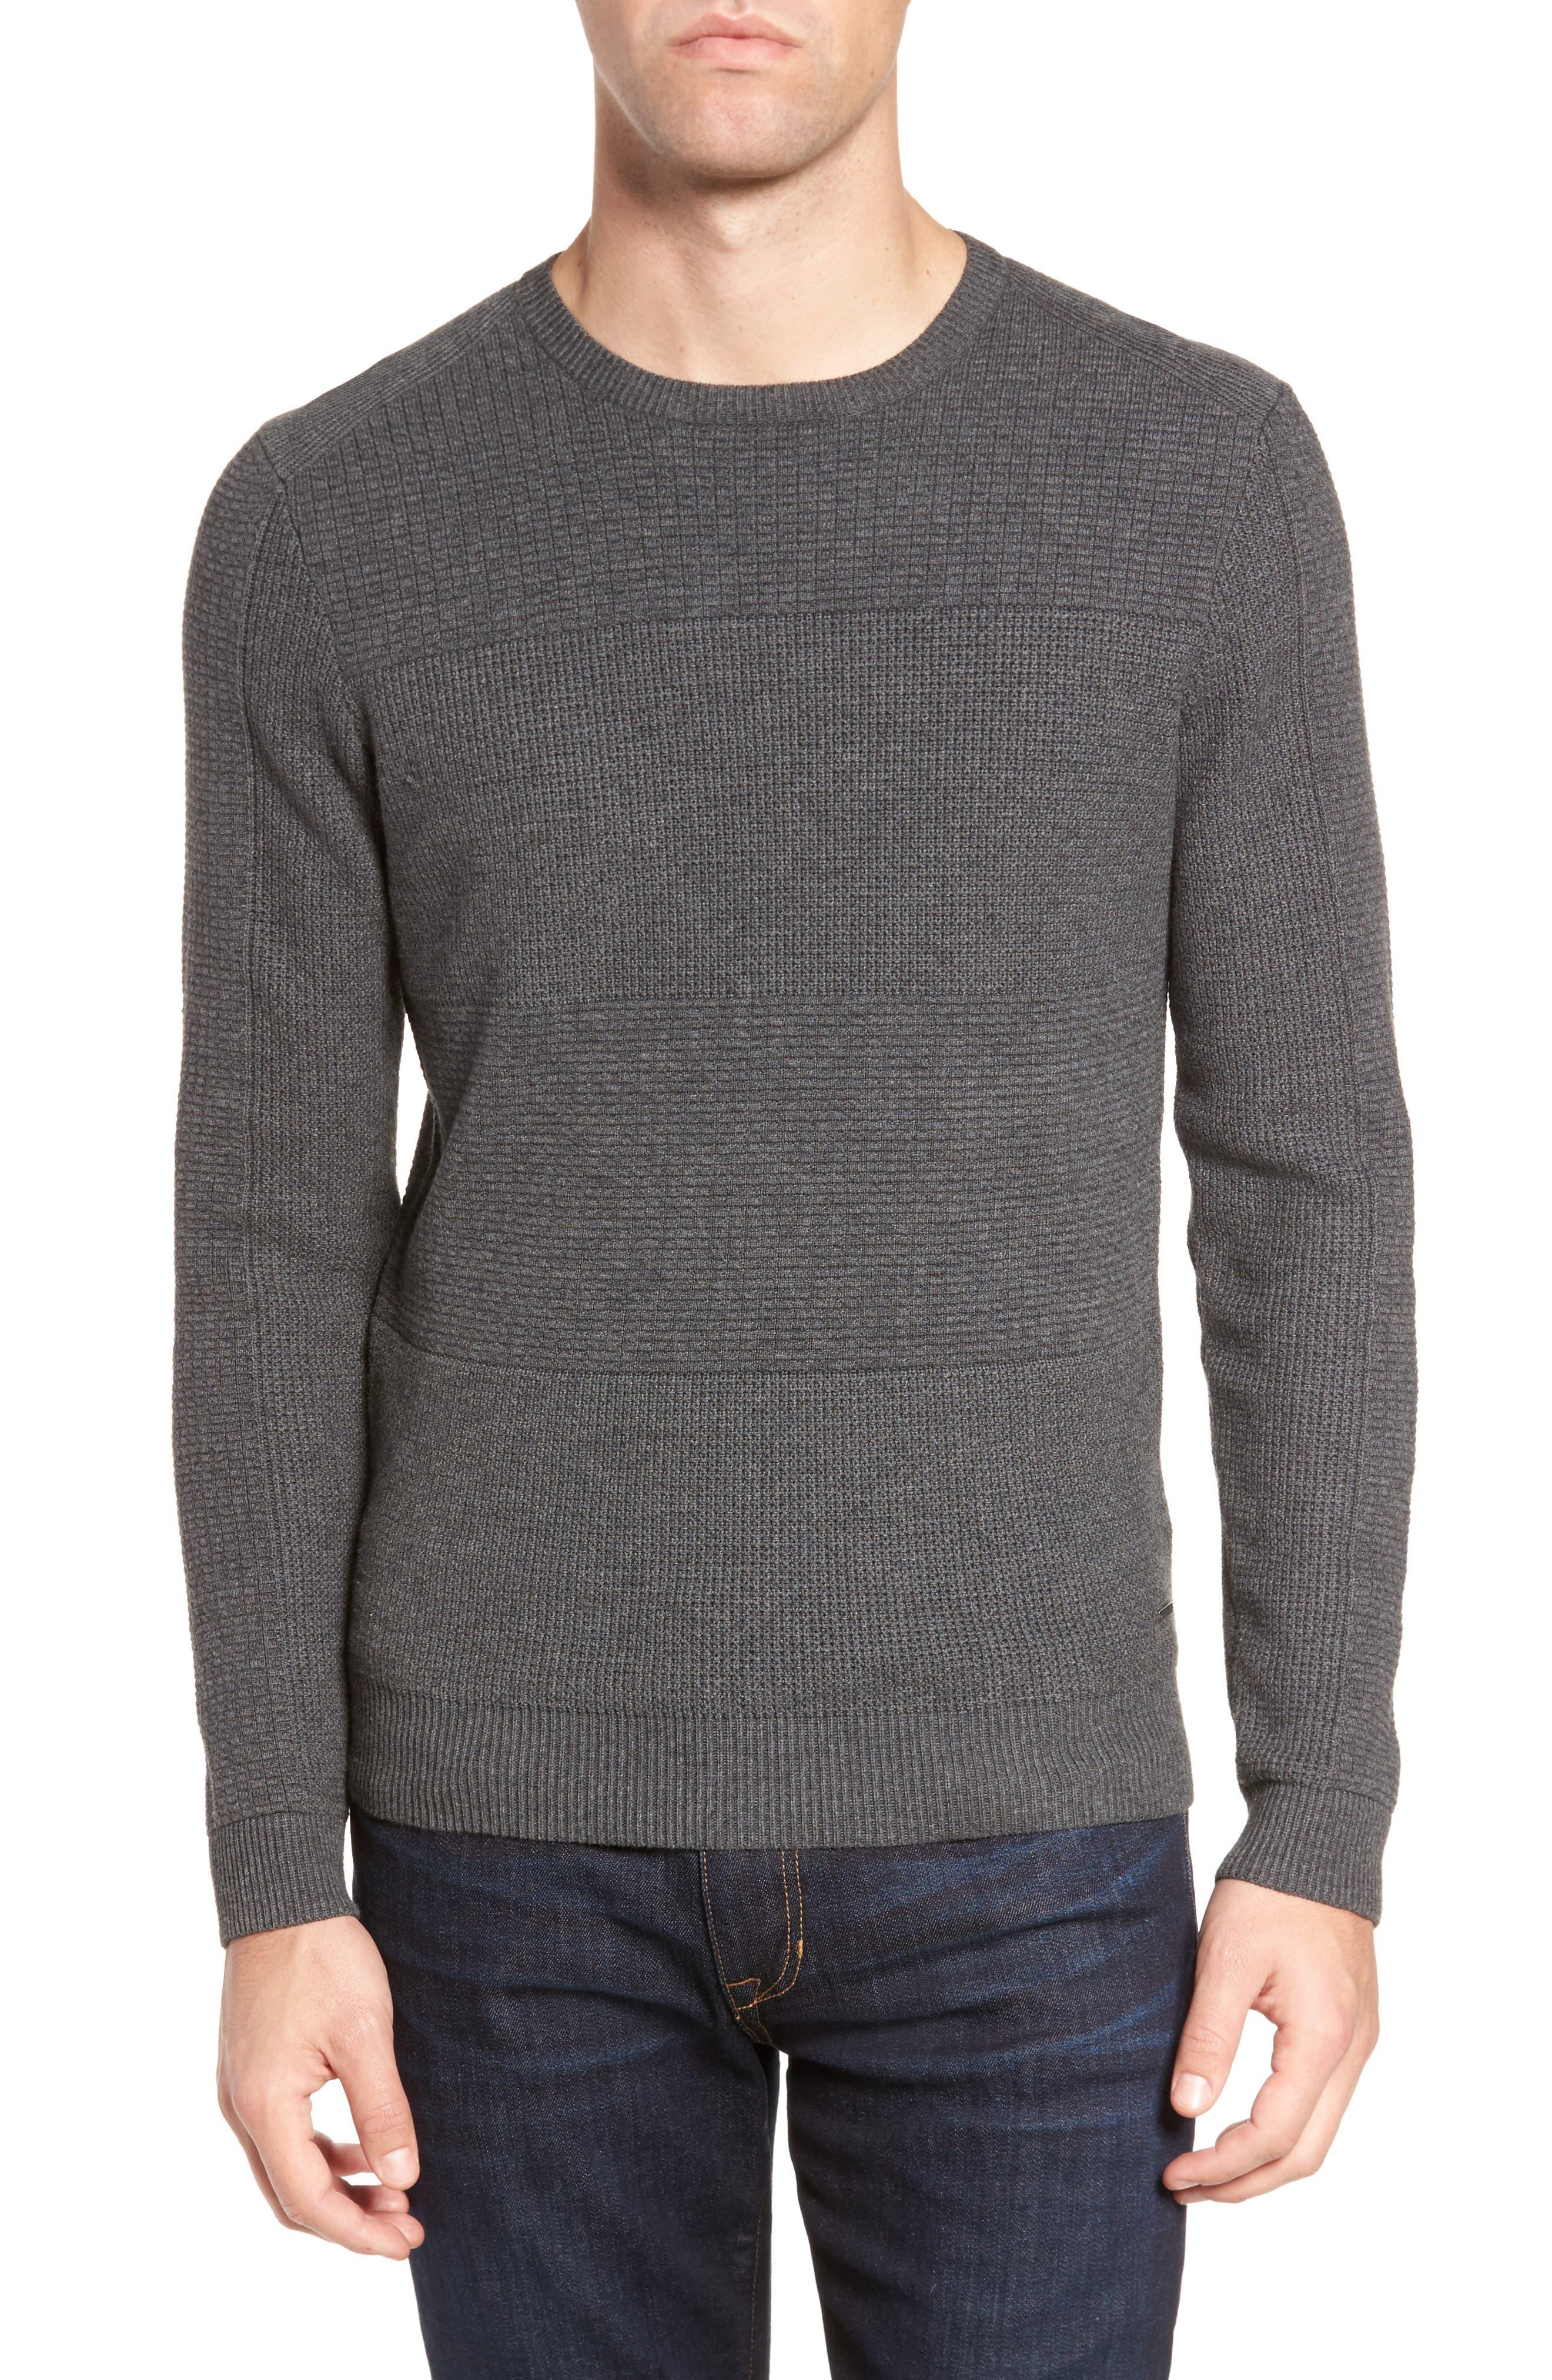 Naranjo Wool & Cotton Sweater,                         Main,                         color, Grey